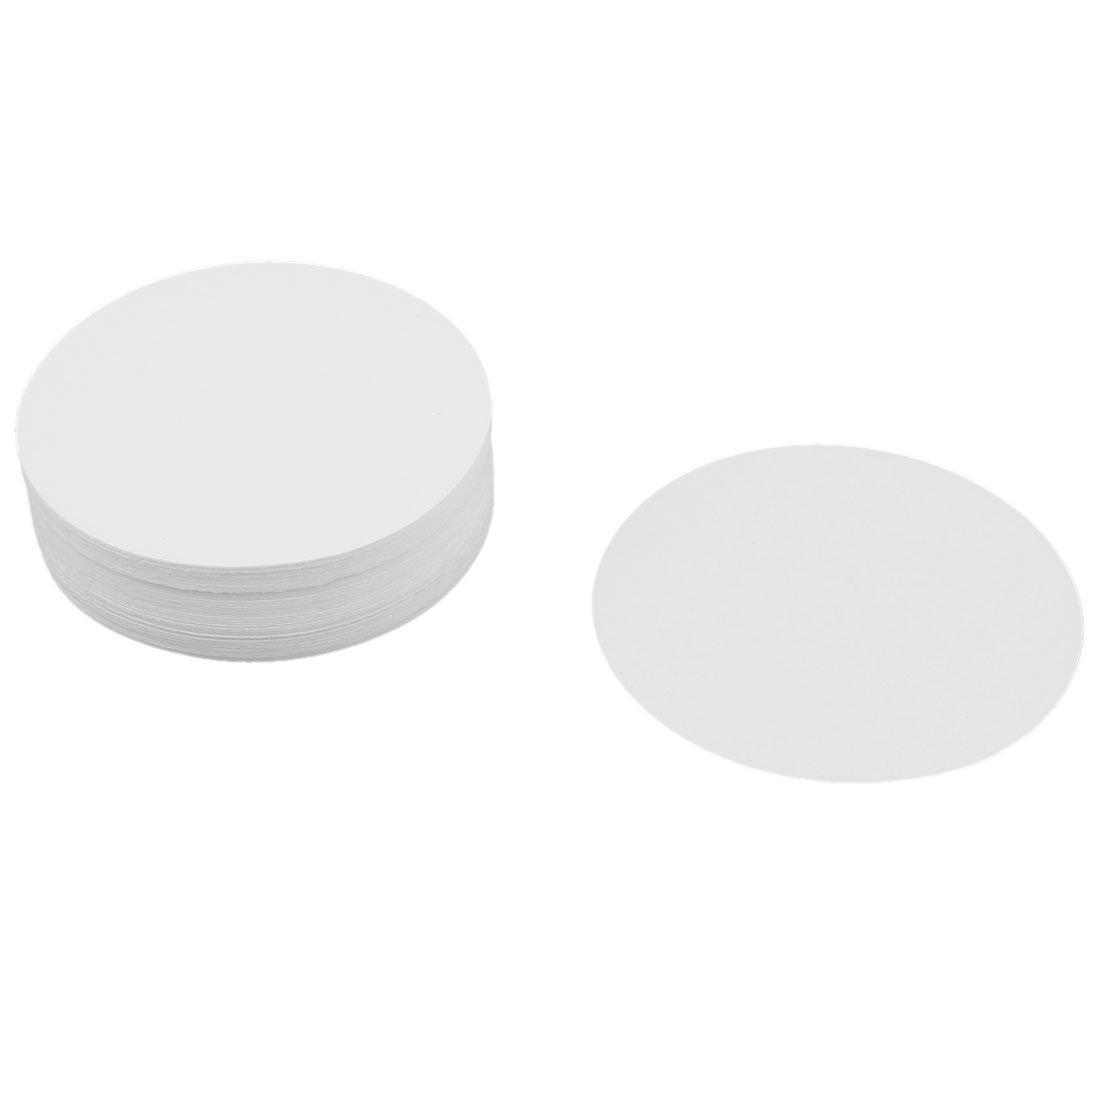 uxcell 100 Pcs Fast Flow 0.15/% Ash Content 7cm Dia Qualitative Filter Paper